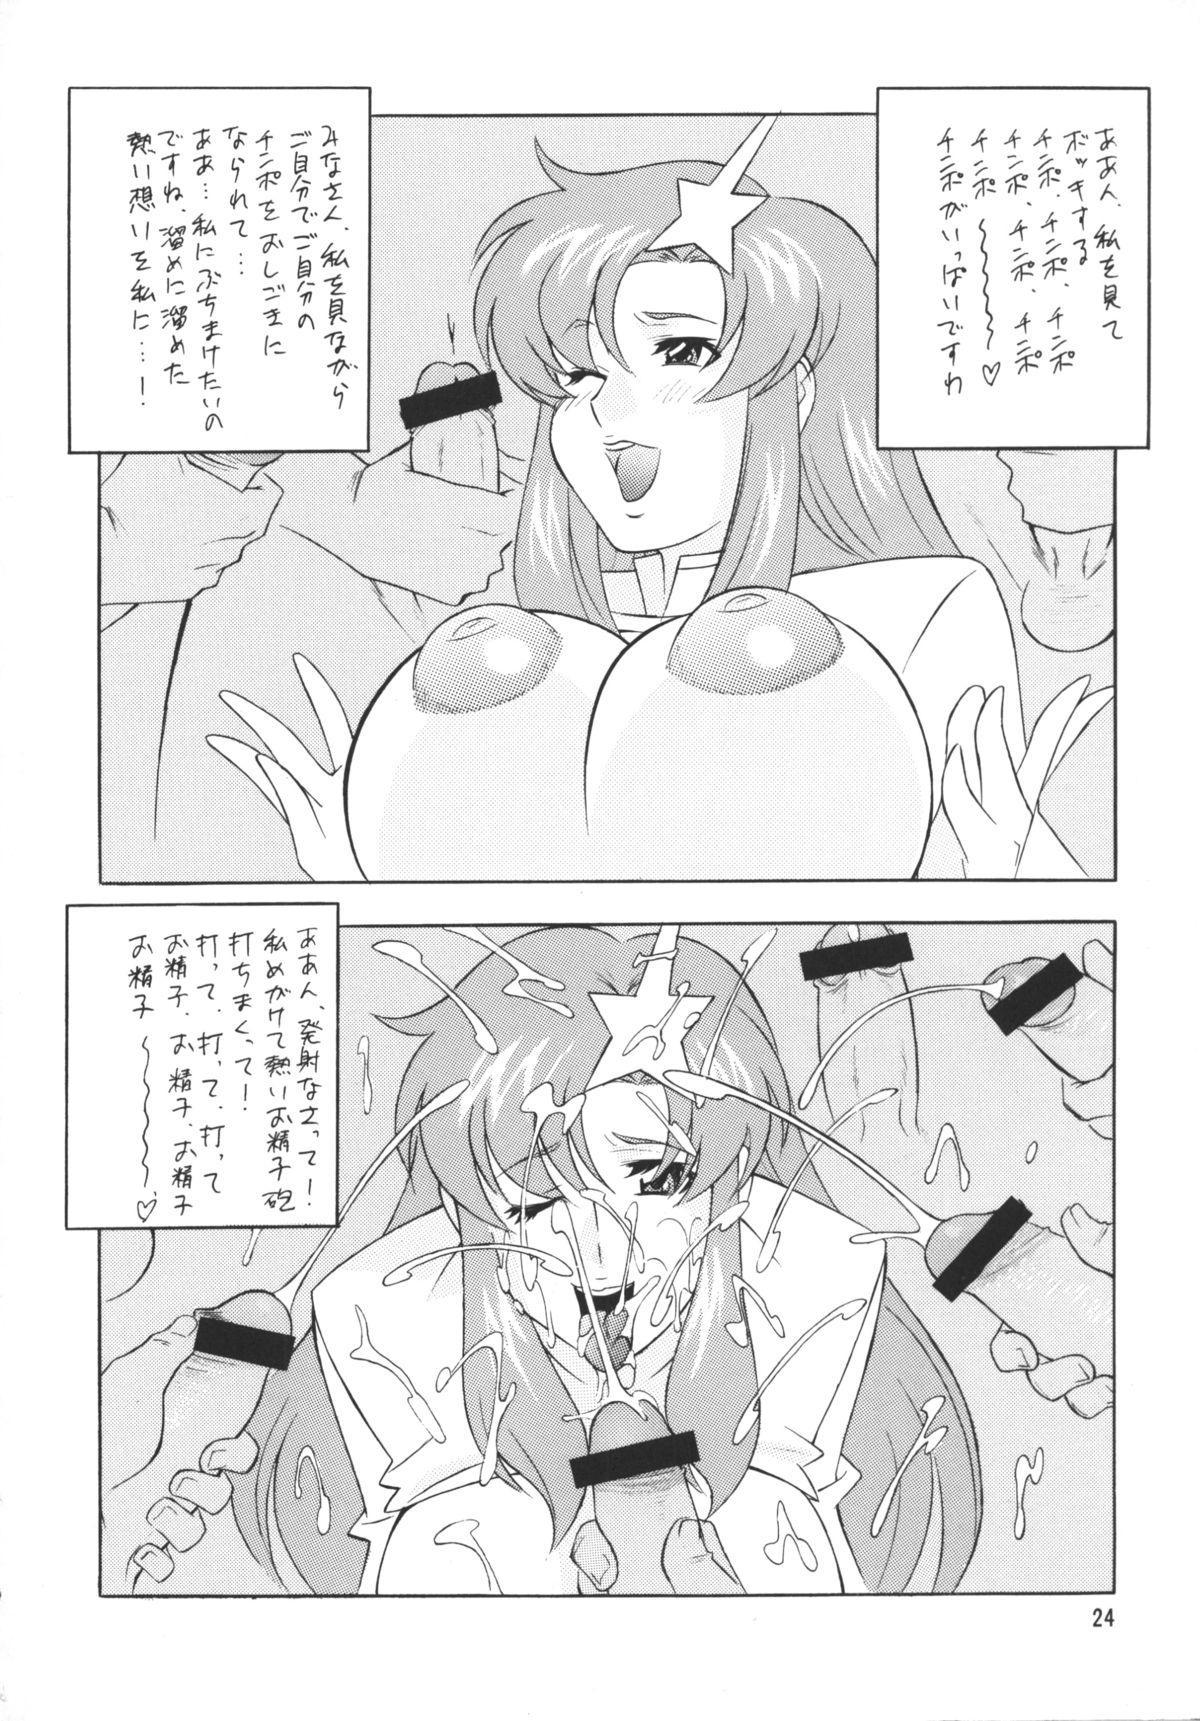 [Okachimentaiko (H-H, Minazuki Akira) Oh! Hentai (Various) 22